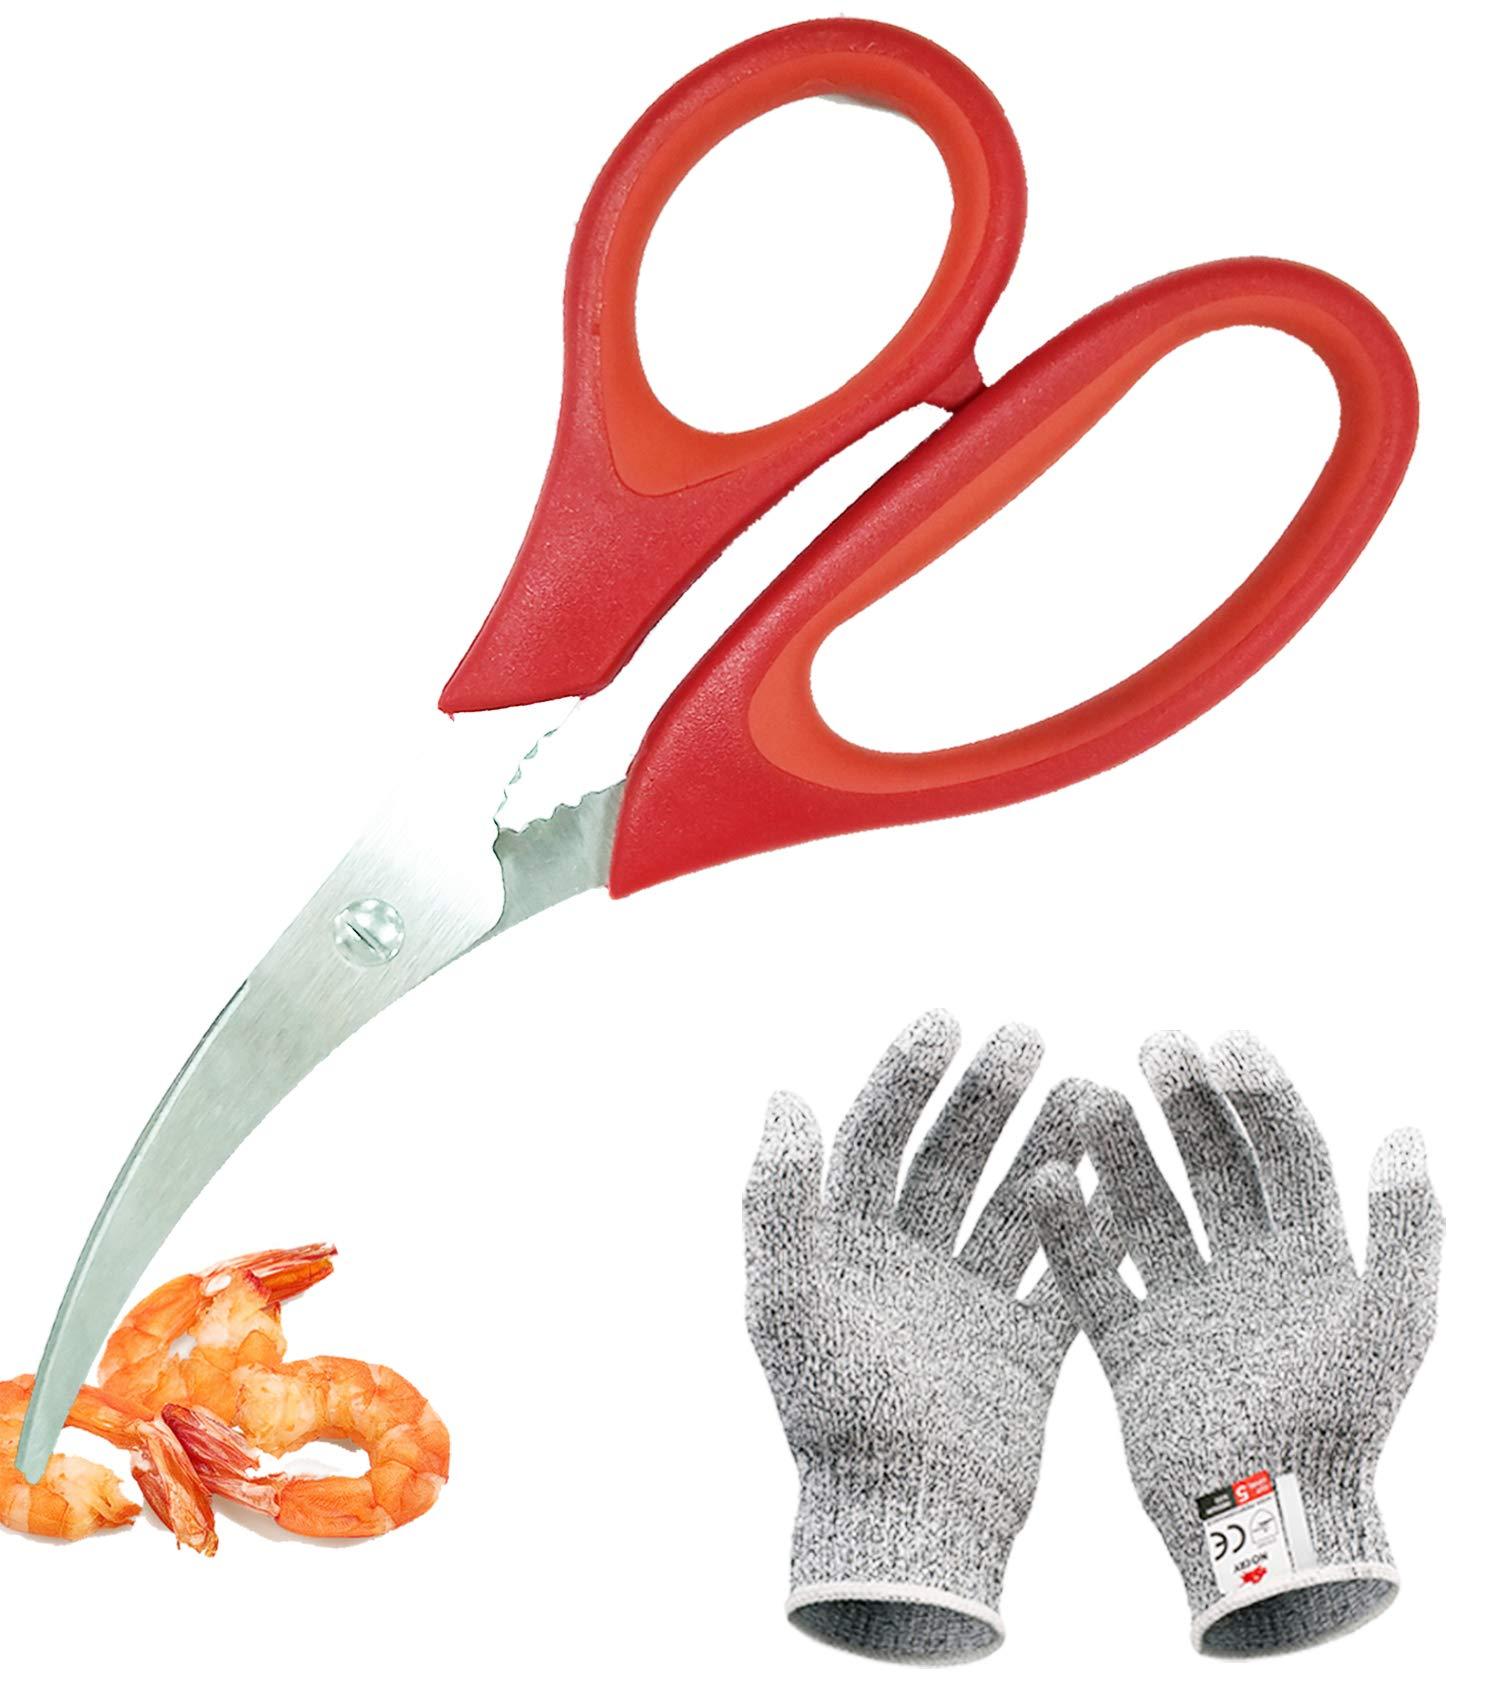 ArtiGifts Shrimp Cleaner Set with Shrimp Deveiner Scissor & Cut Resistant Gloves - Multipurpose Seafood and Prown Peeler Tool, Level 5 Protection Kitchen Gloves Included